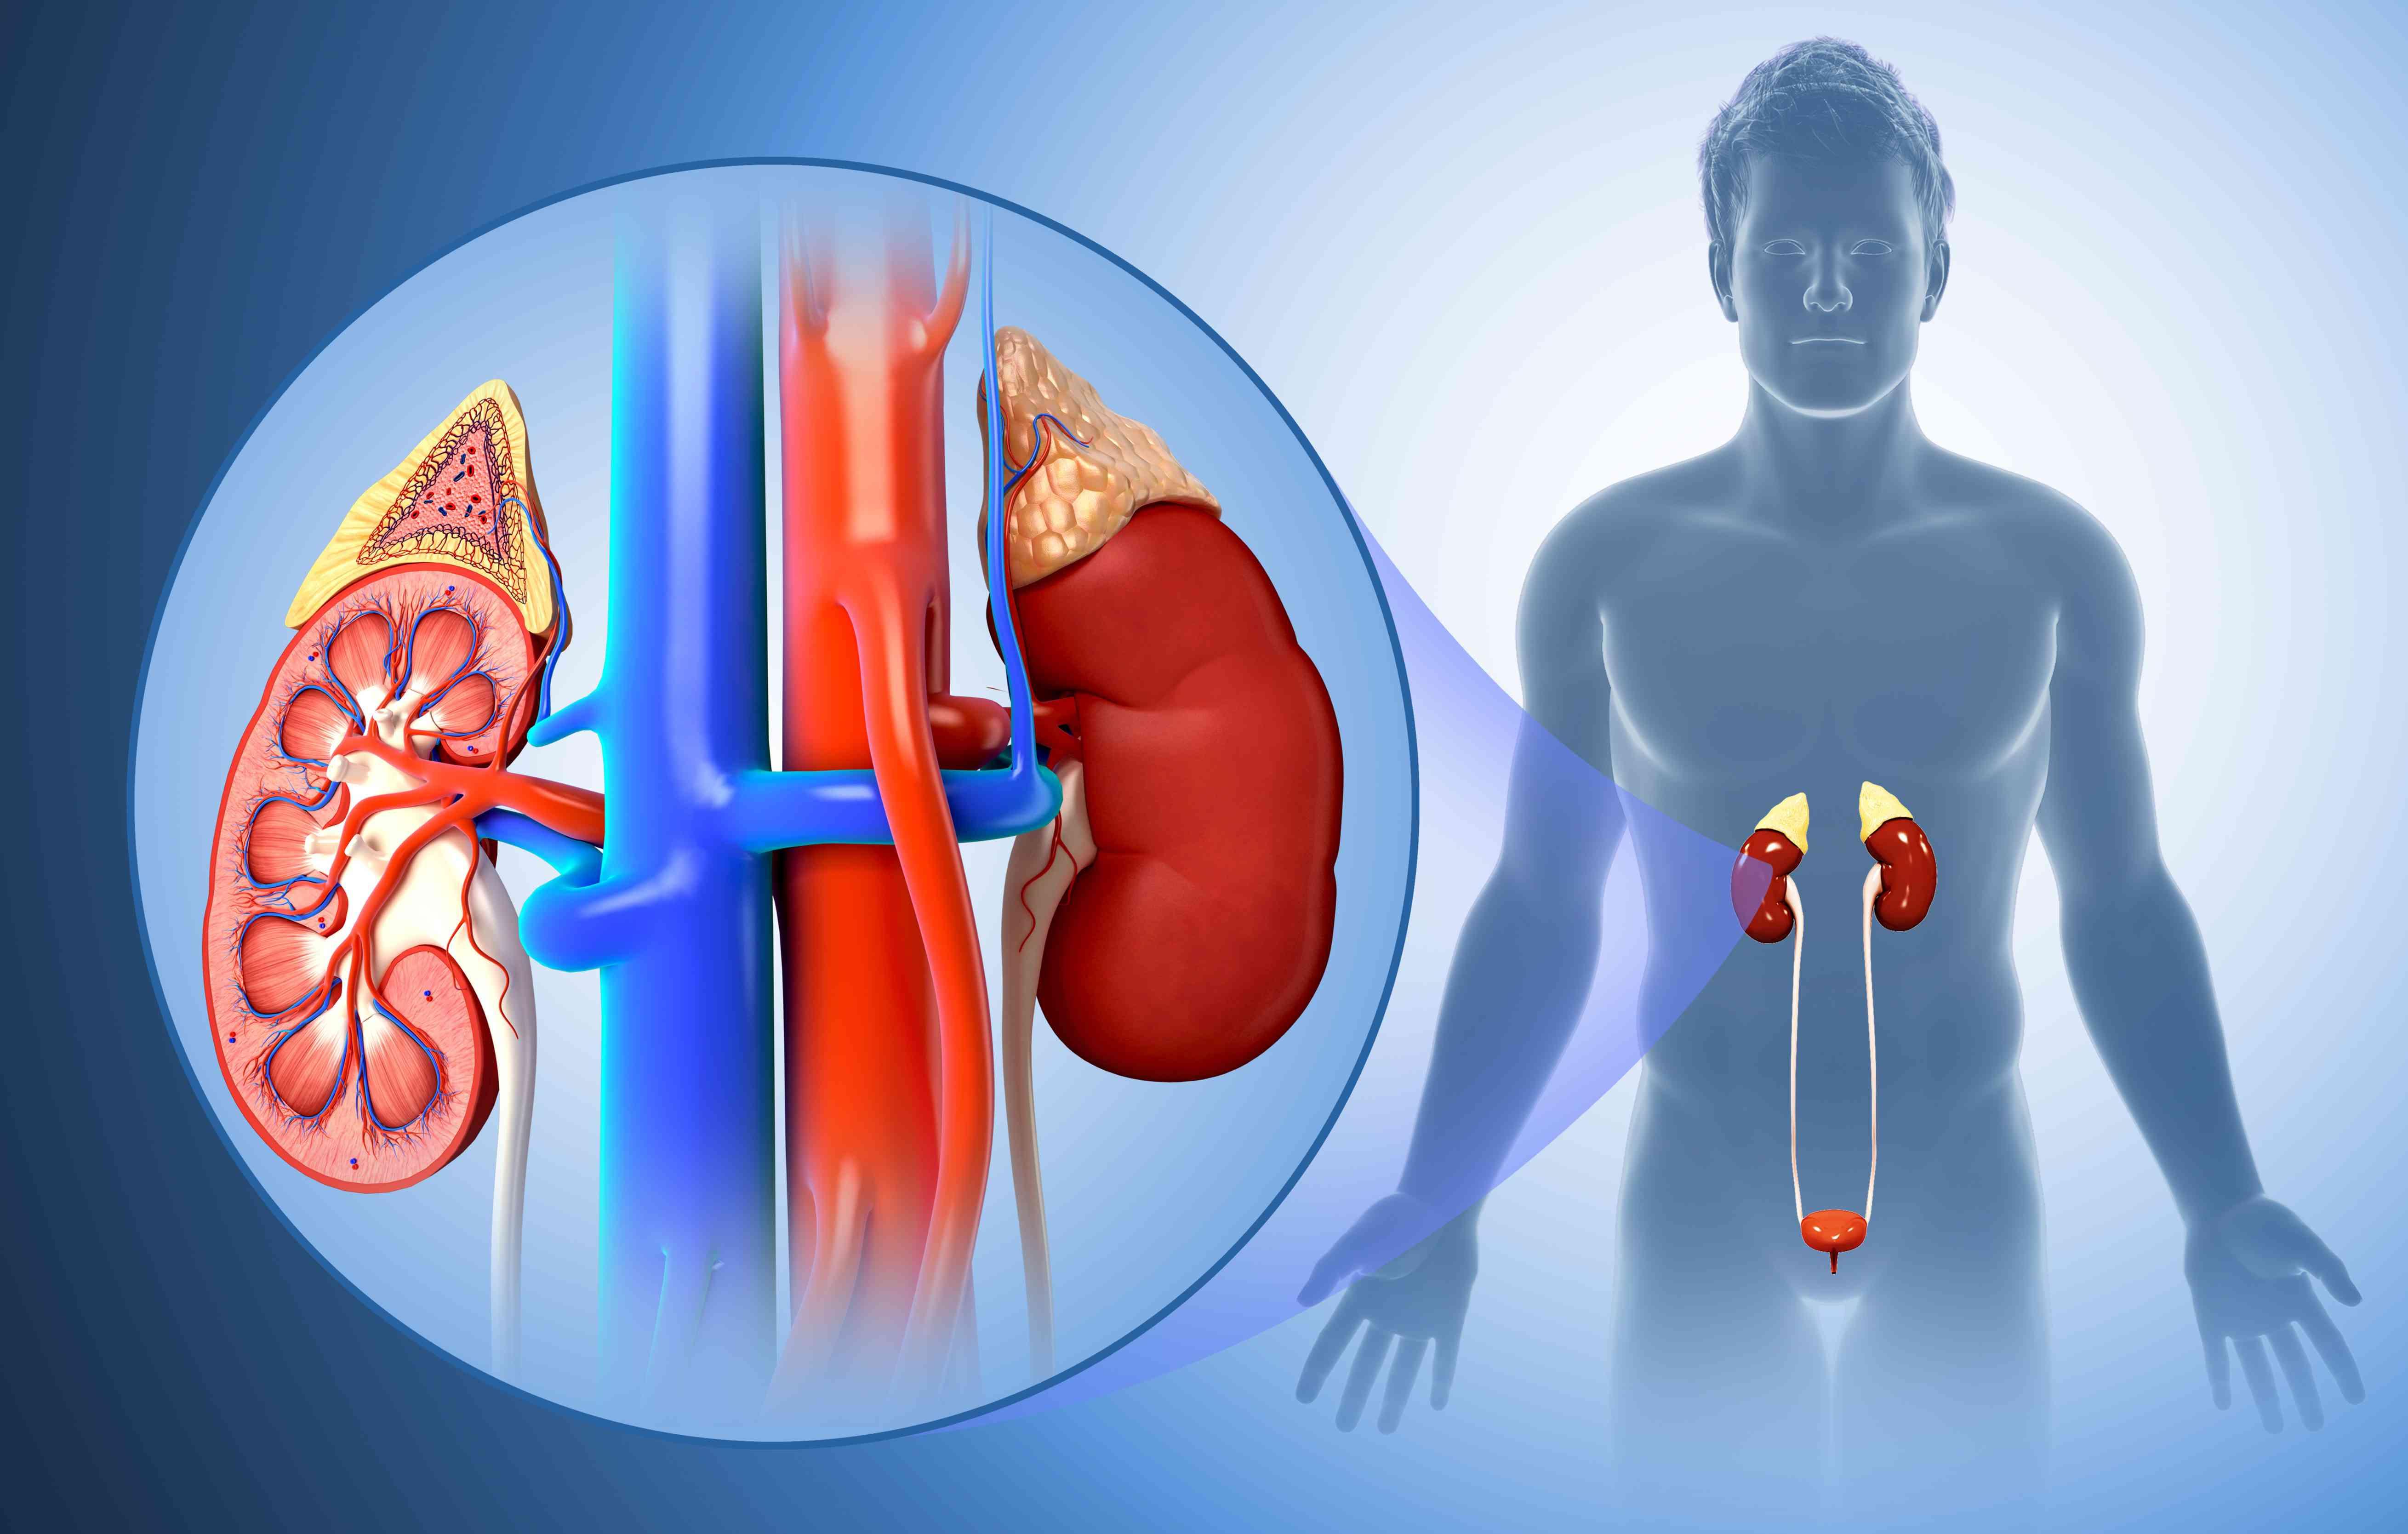 Male kidney anatomy, illustration